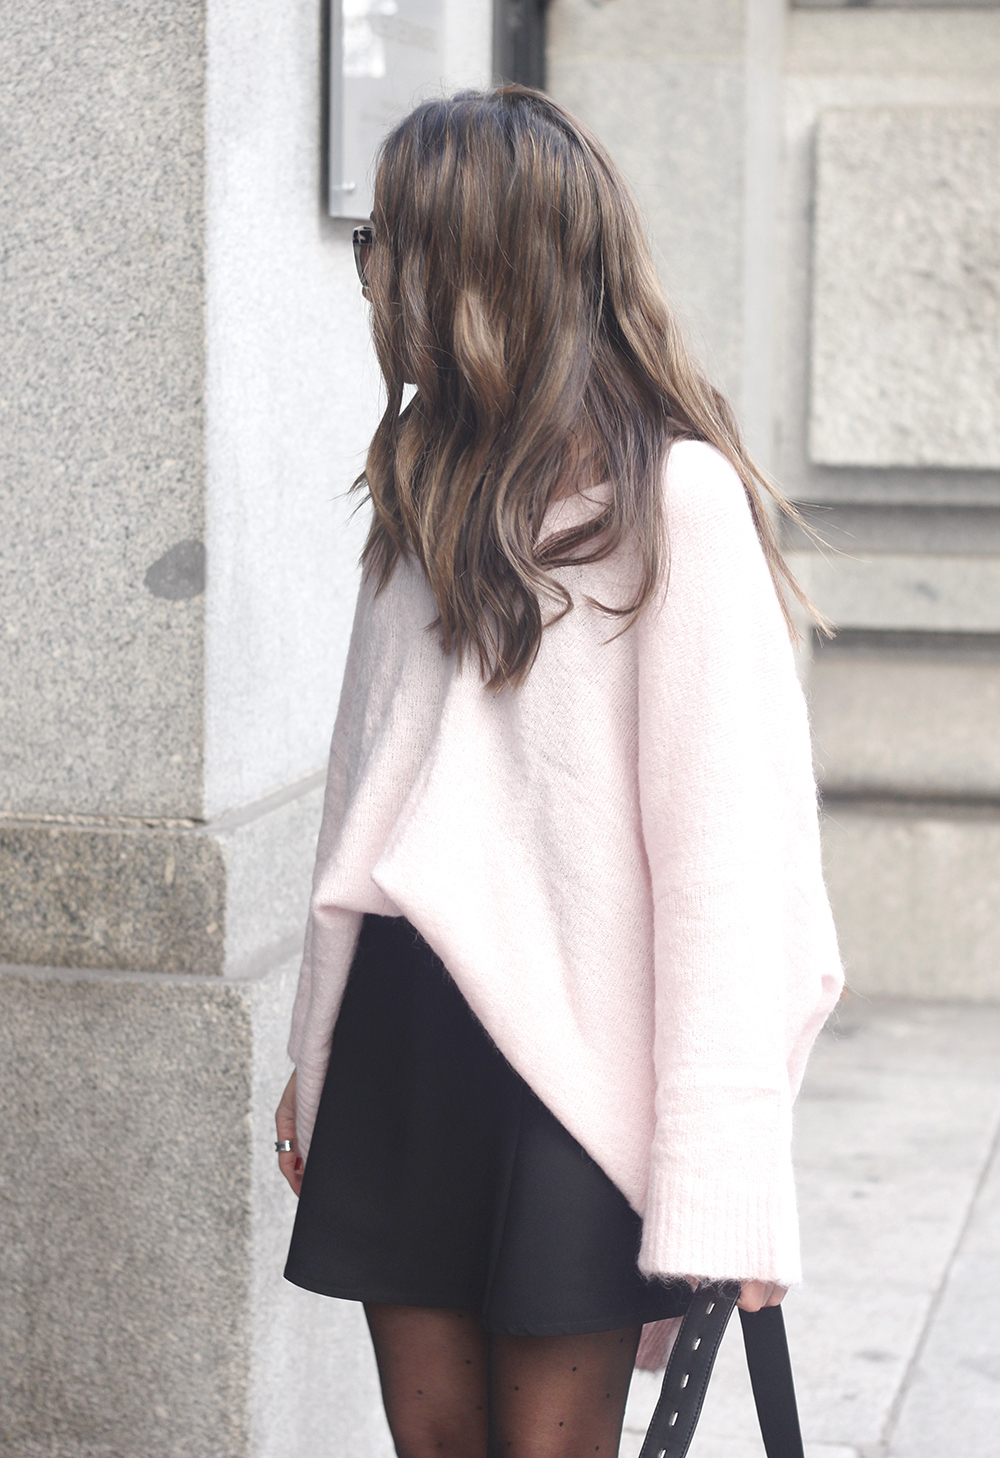 Pink sweater black skirt bulgari ring gloria ortiz bag heels outfit styel fashion11